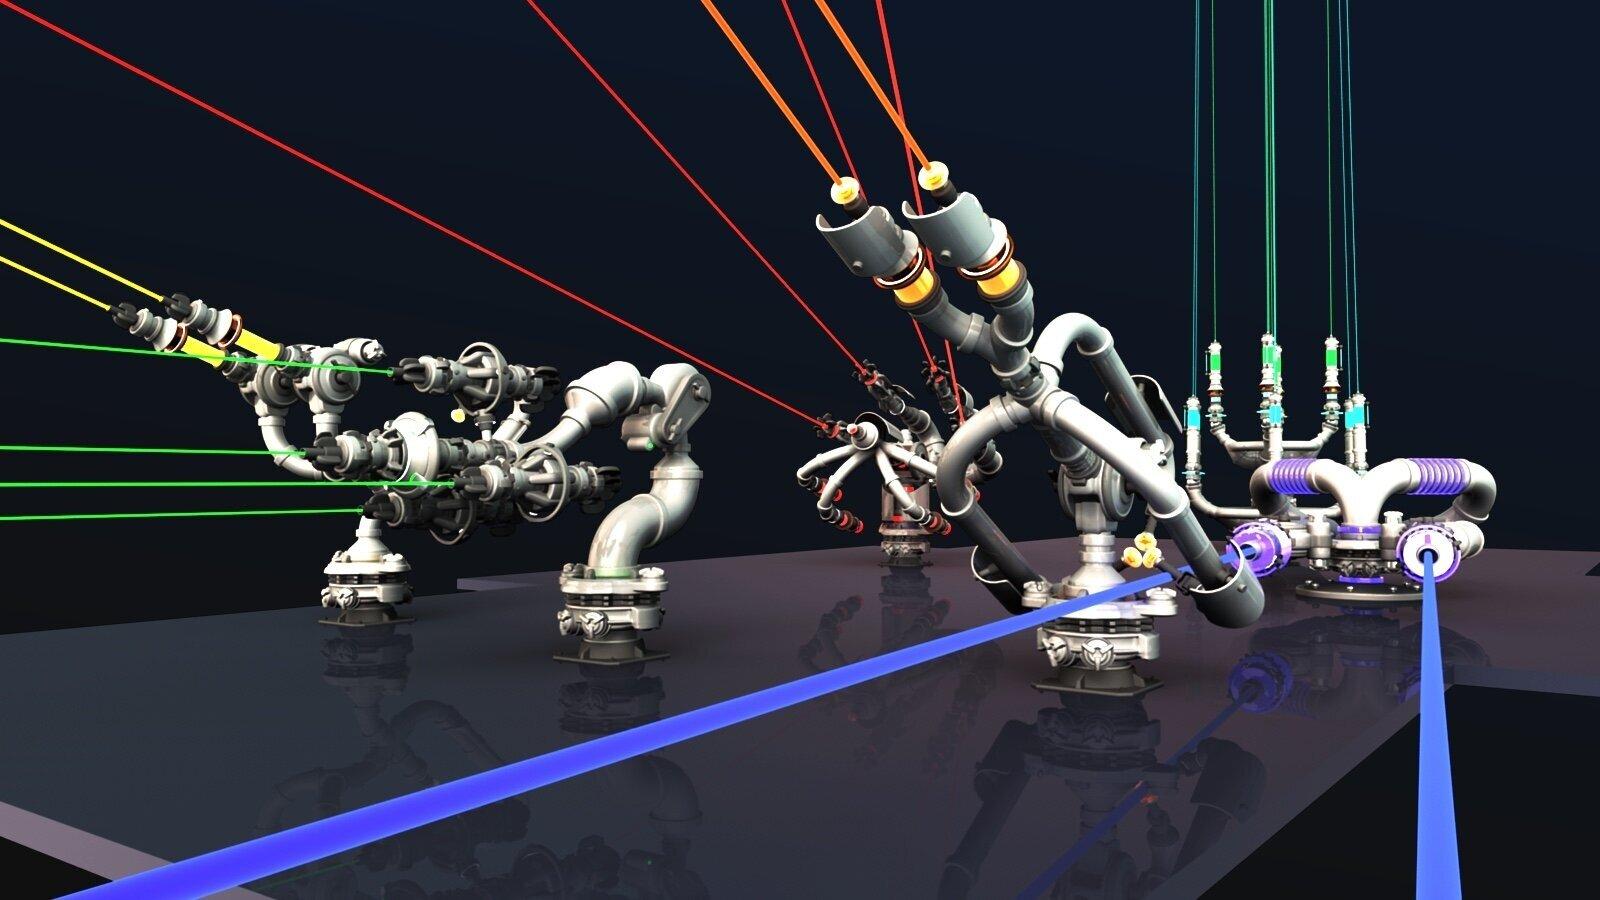 20110318101909079-SC_Lasers.jpg